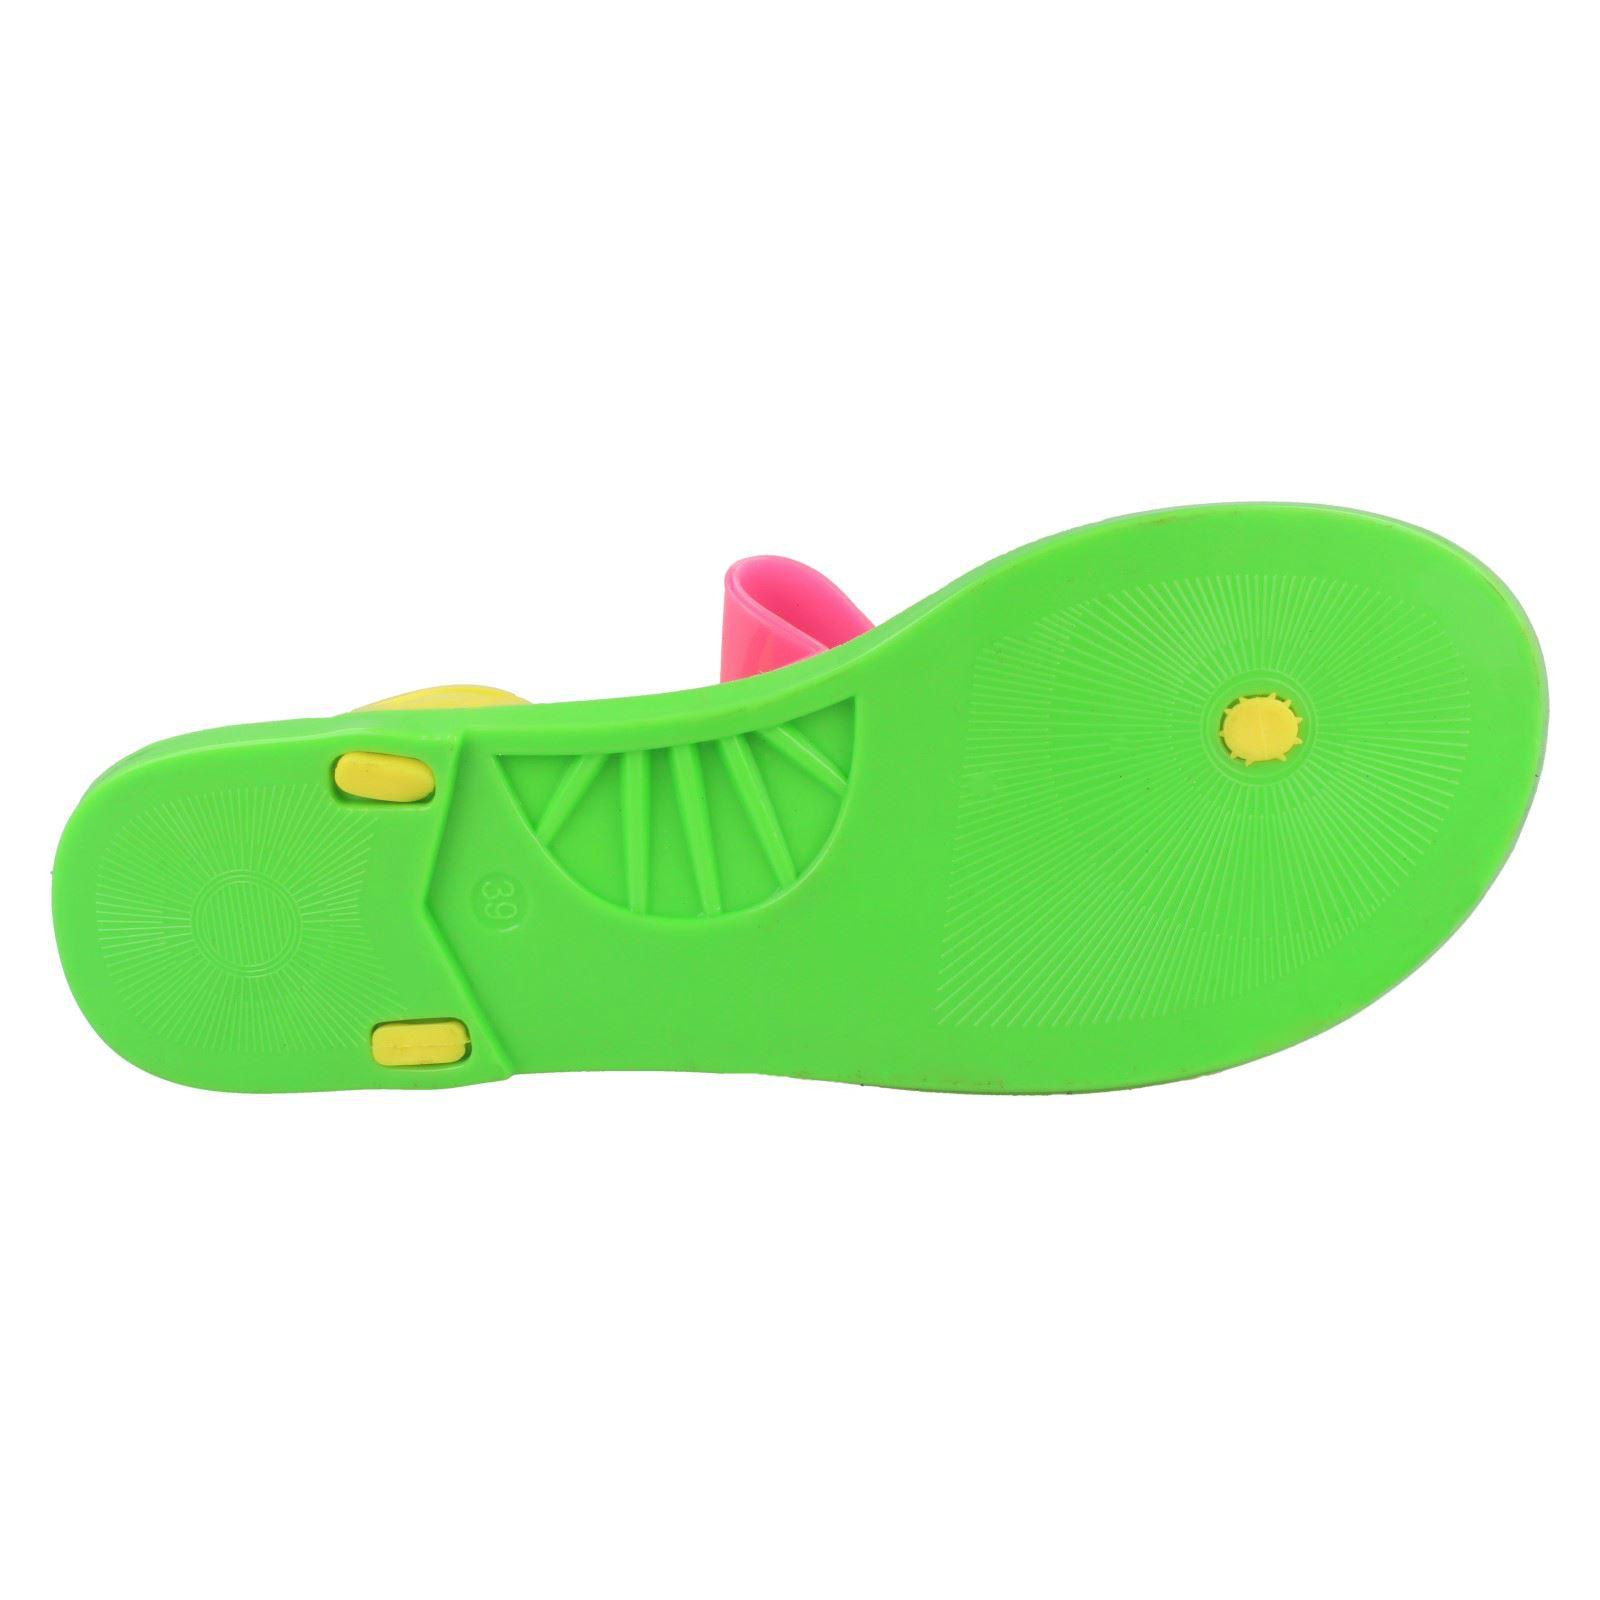 "Filles Spot on Plat Toe Post Bow /""Sandales/'s"